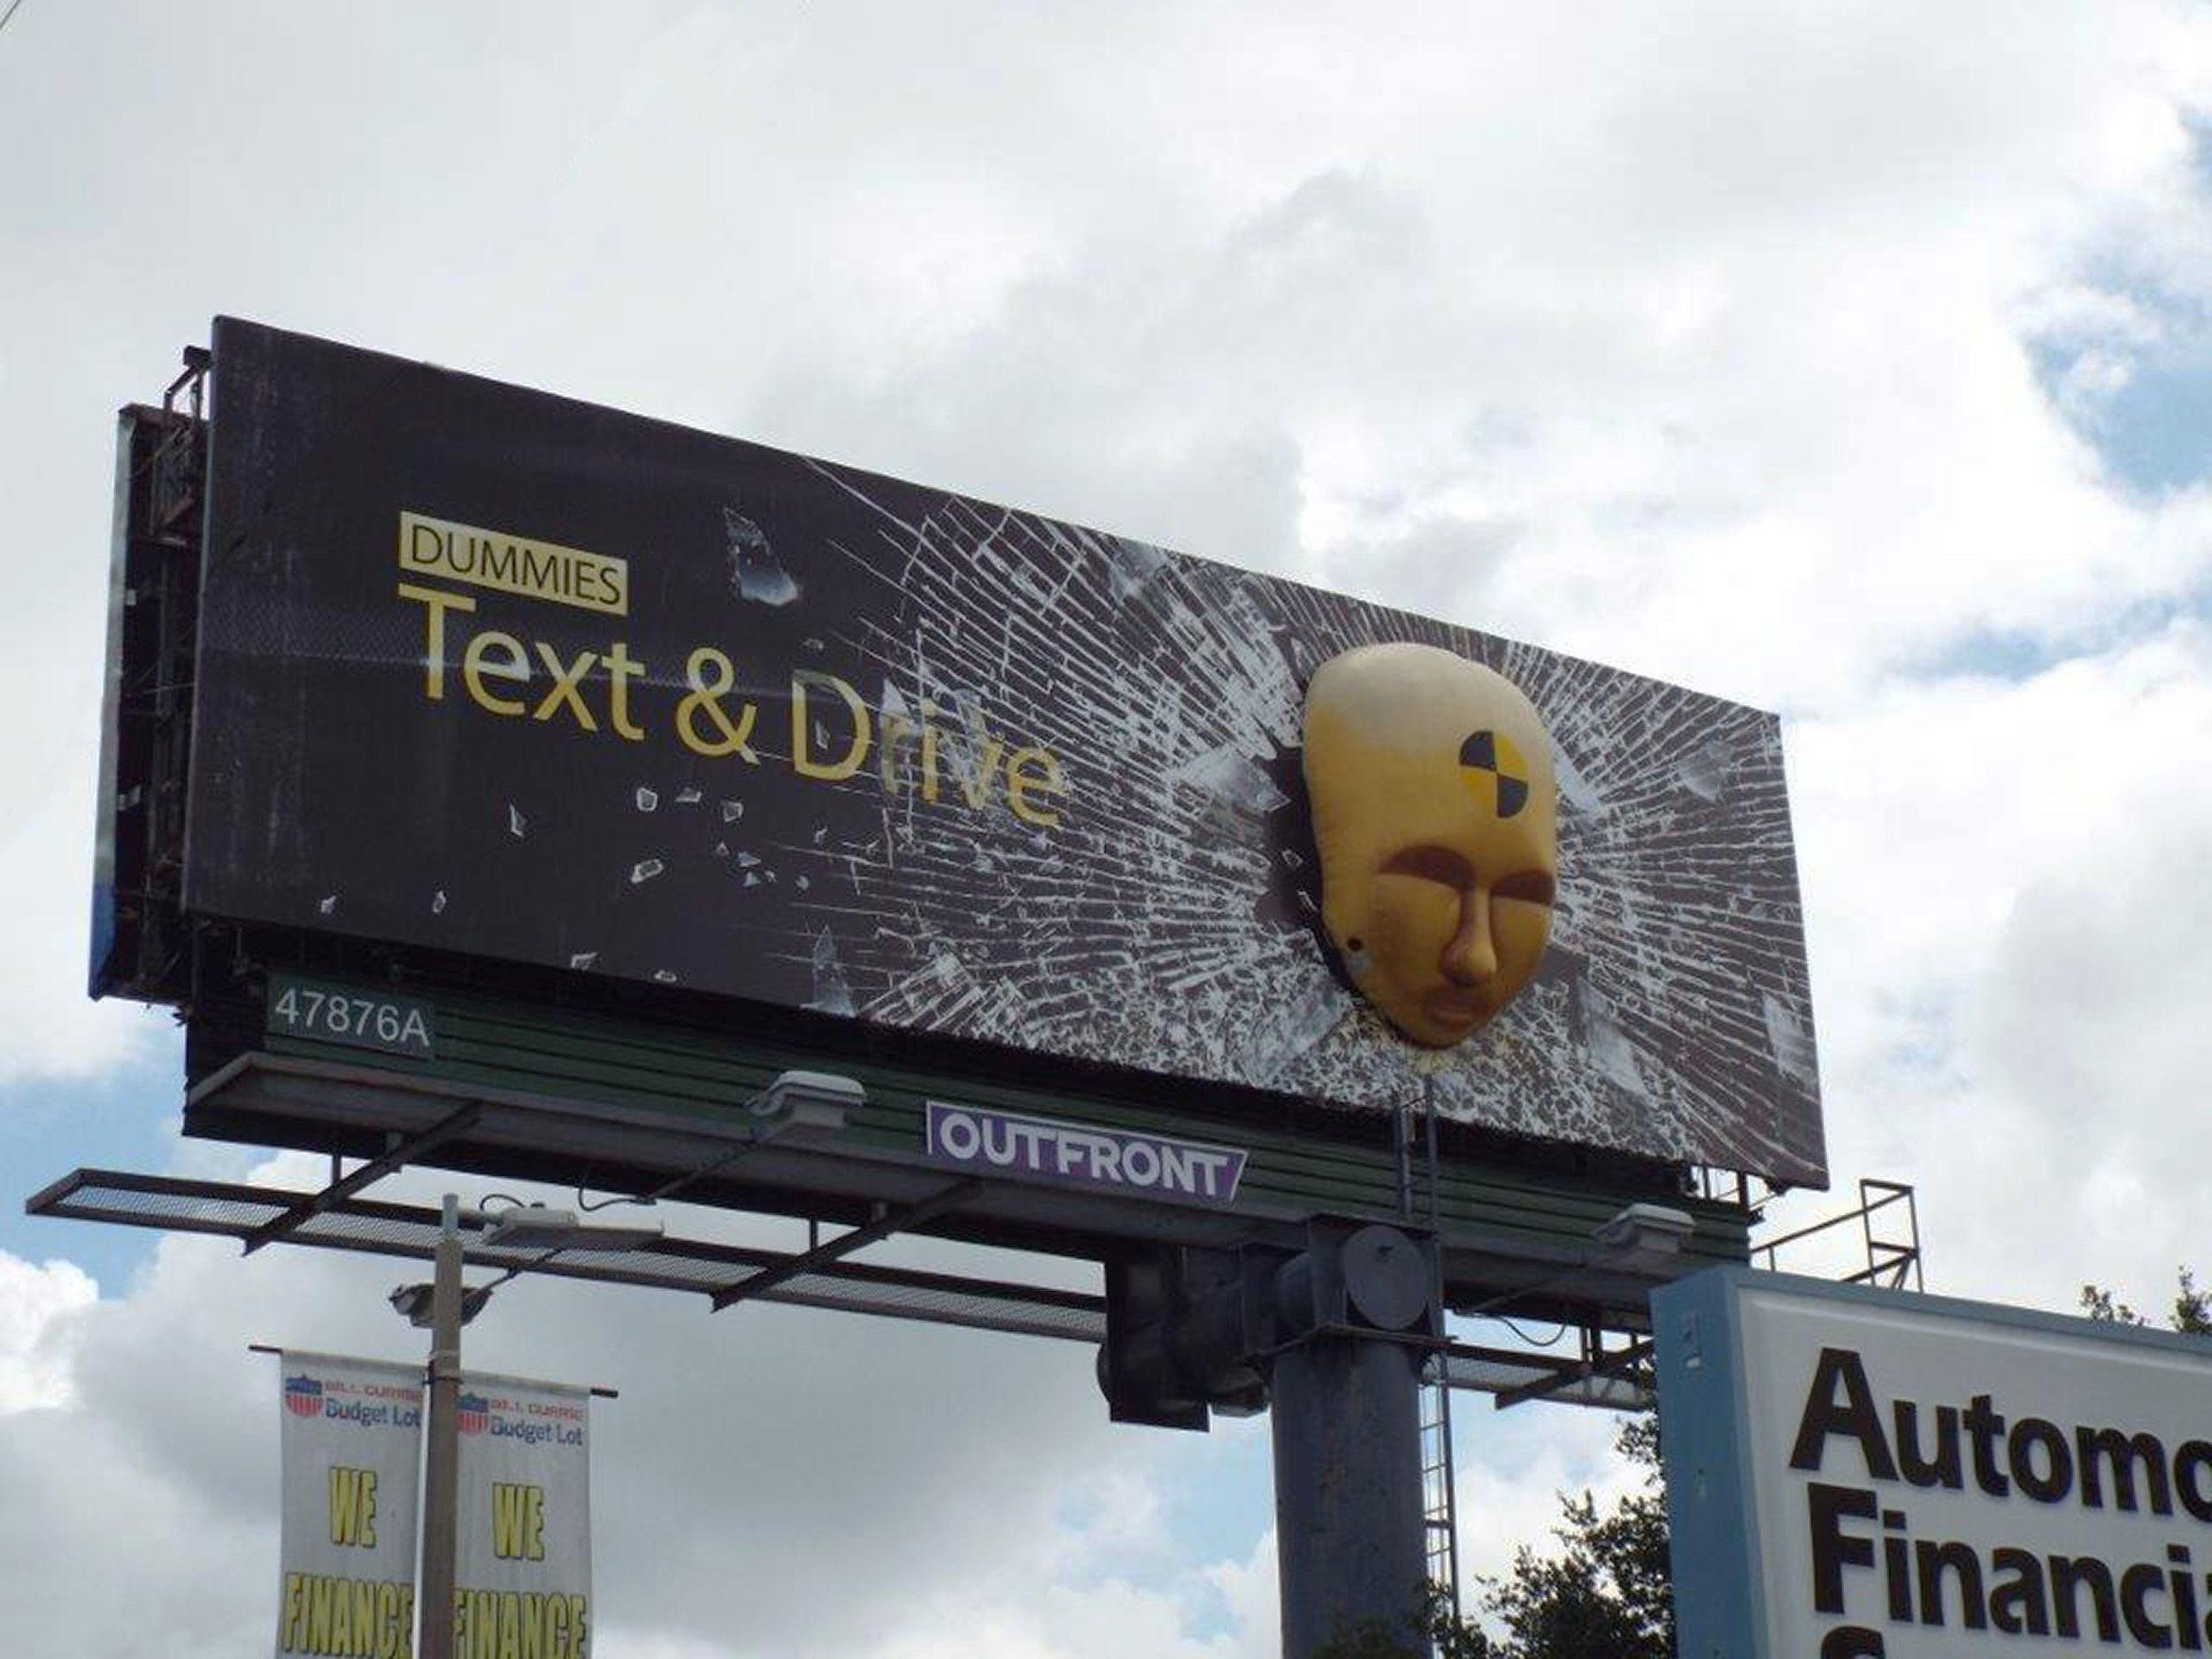 Dummies_textanddrive3.jpg